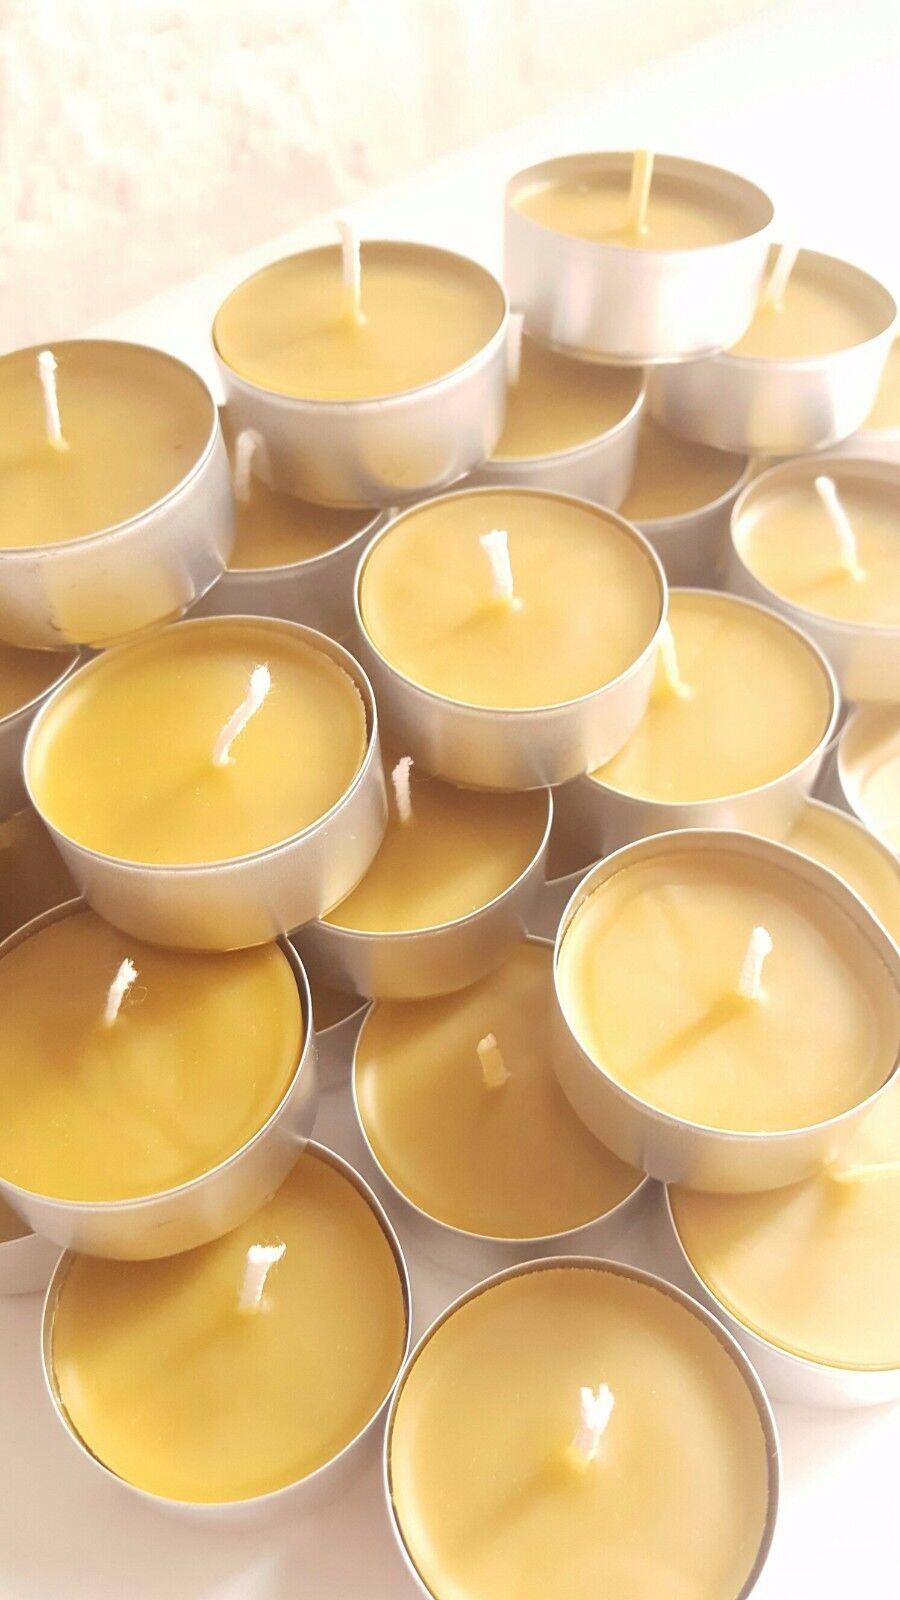 CERA D'API Lumini Cera D'Api Naturale TEA LIGHT LIGHT LIGHT CANDELE calda luce del sole l'aria purificatore 6b5f3d